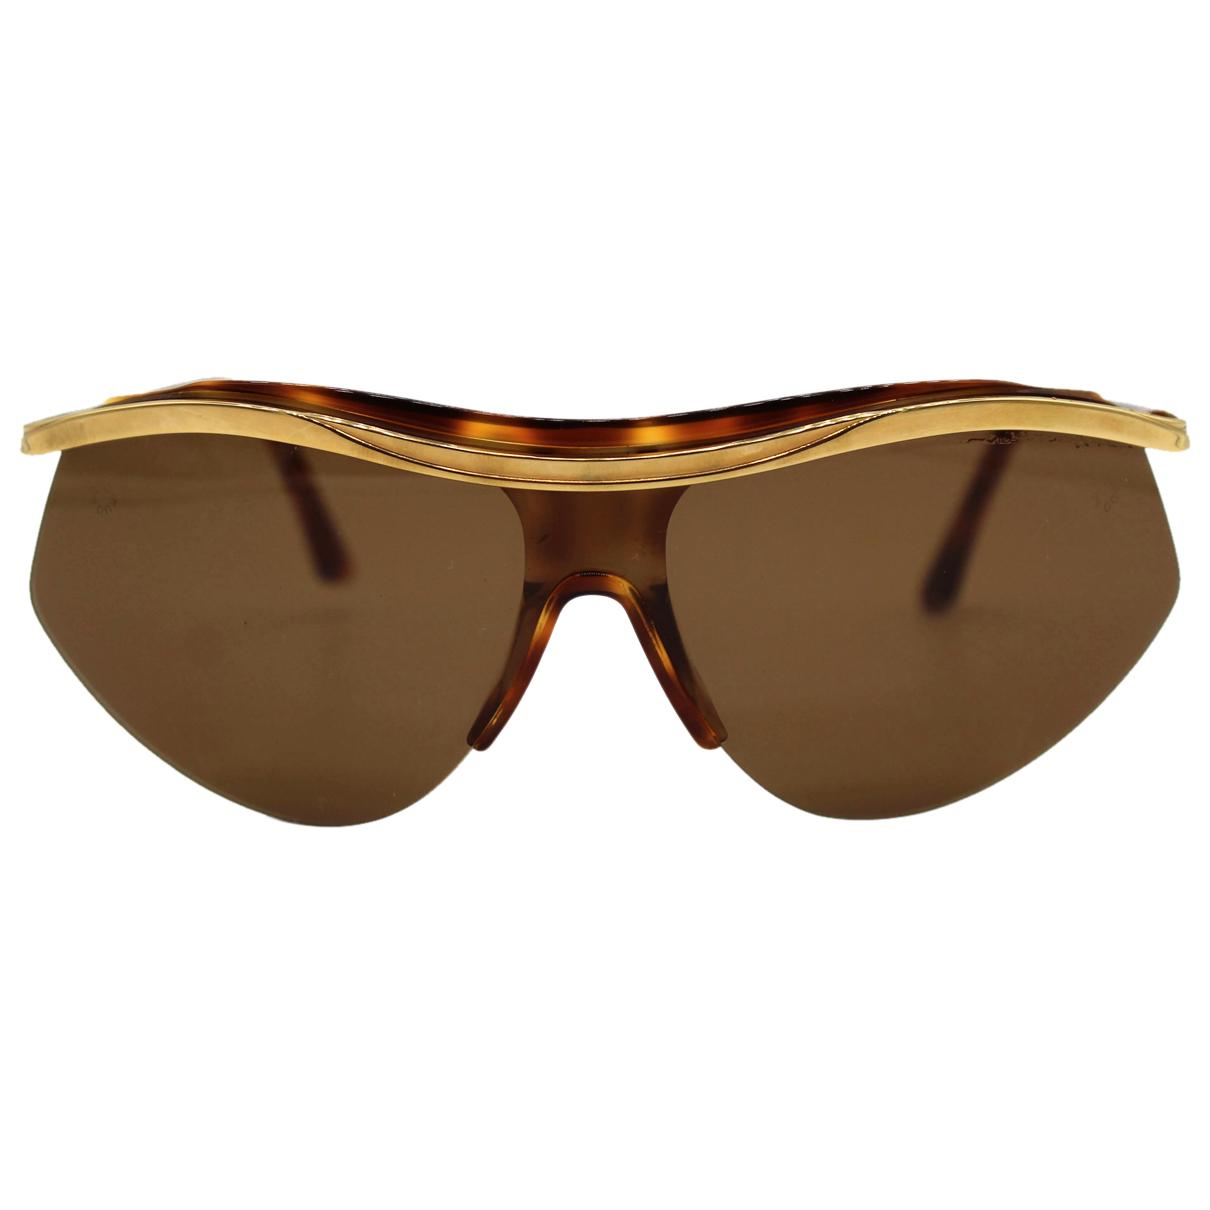 Emanuel Ungaro N Brown Metal Sunglasses for Women N